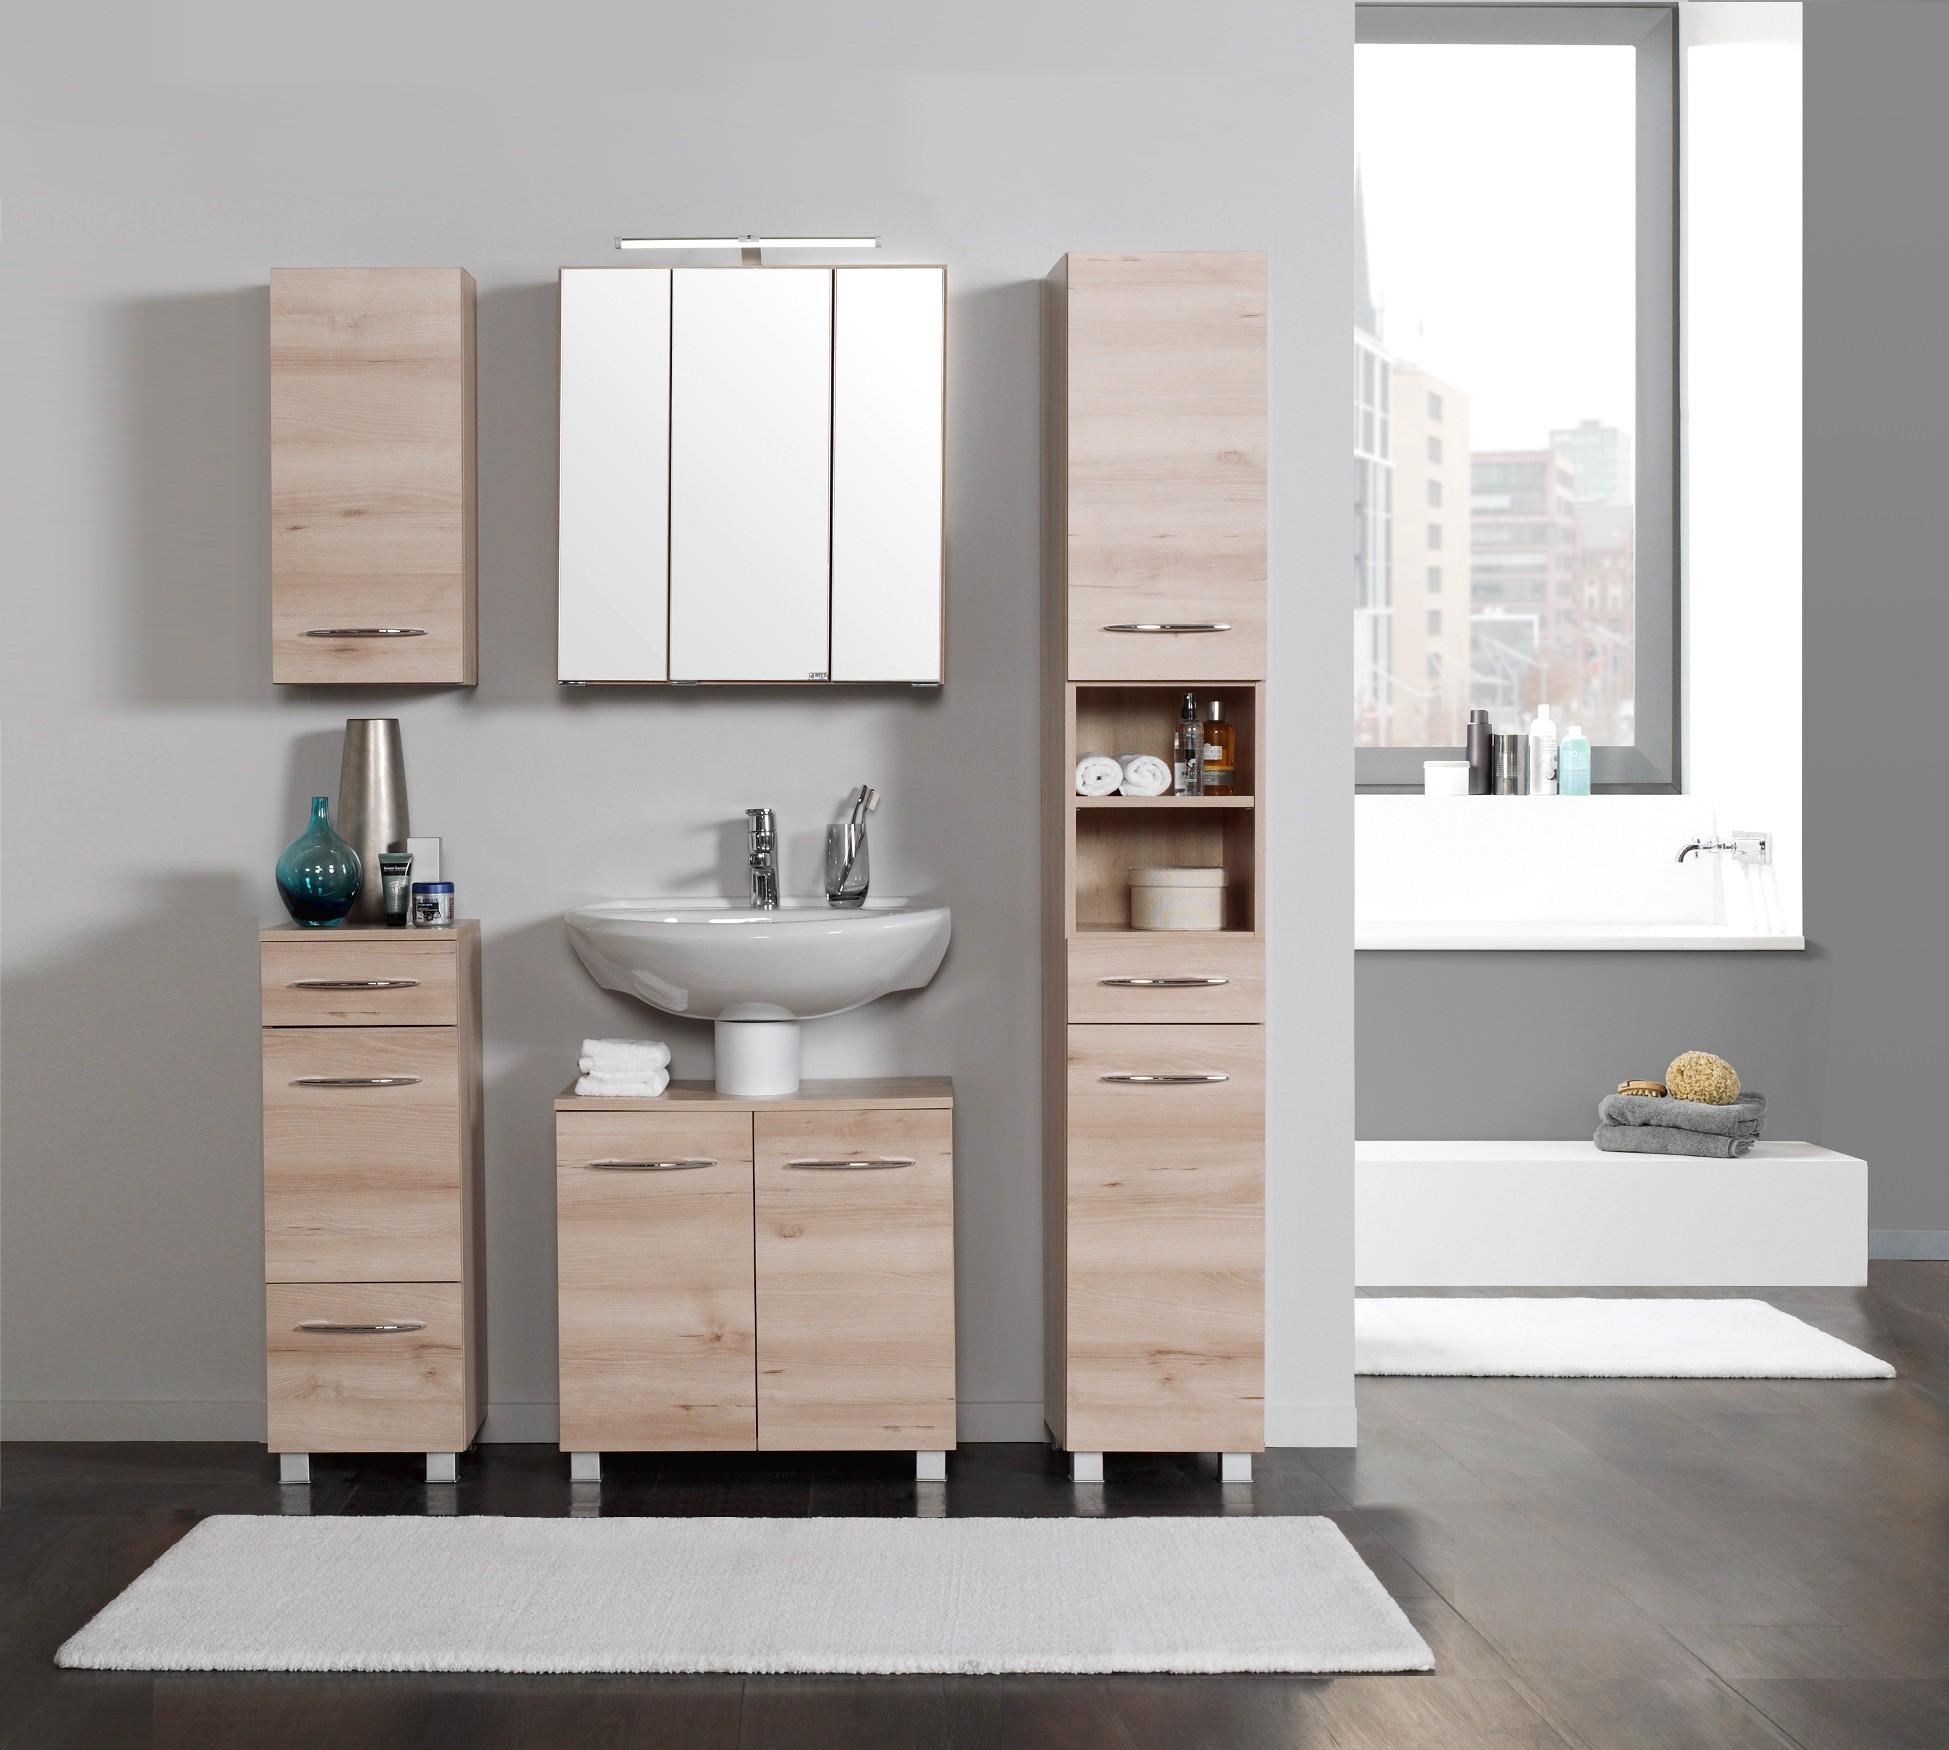 badm bel set portofino 6 teilig 120 cm breit buche. Black Bedroom Furniture Sets. Home Design Ideas